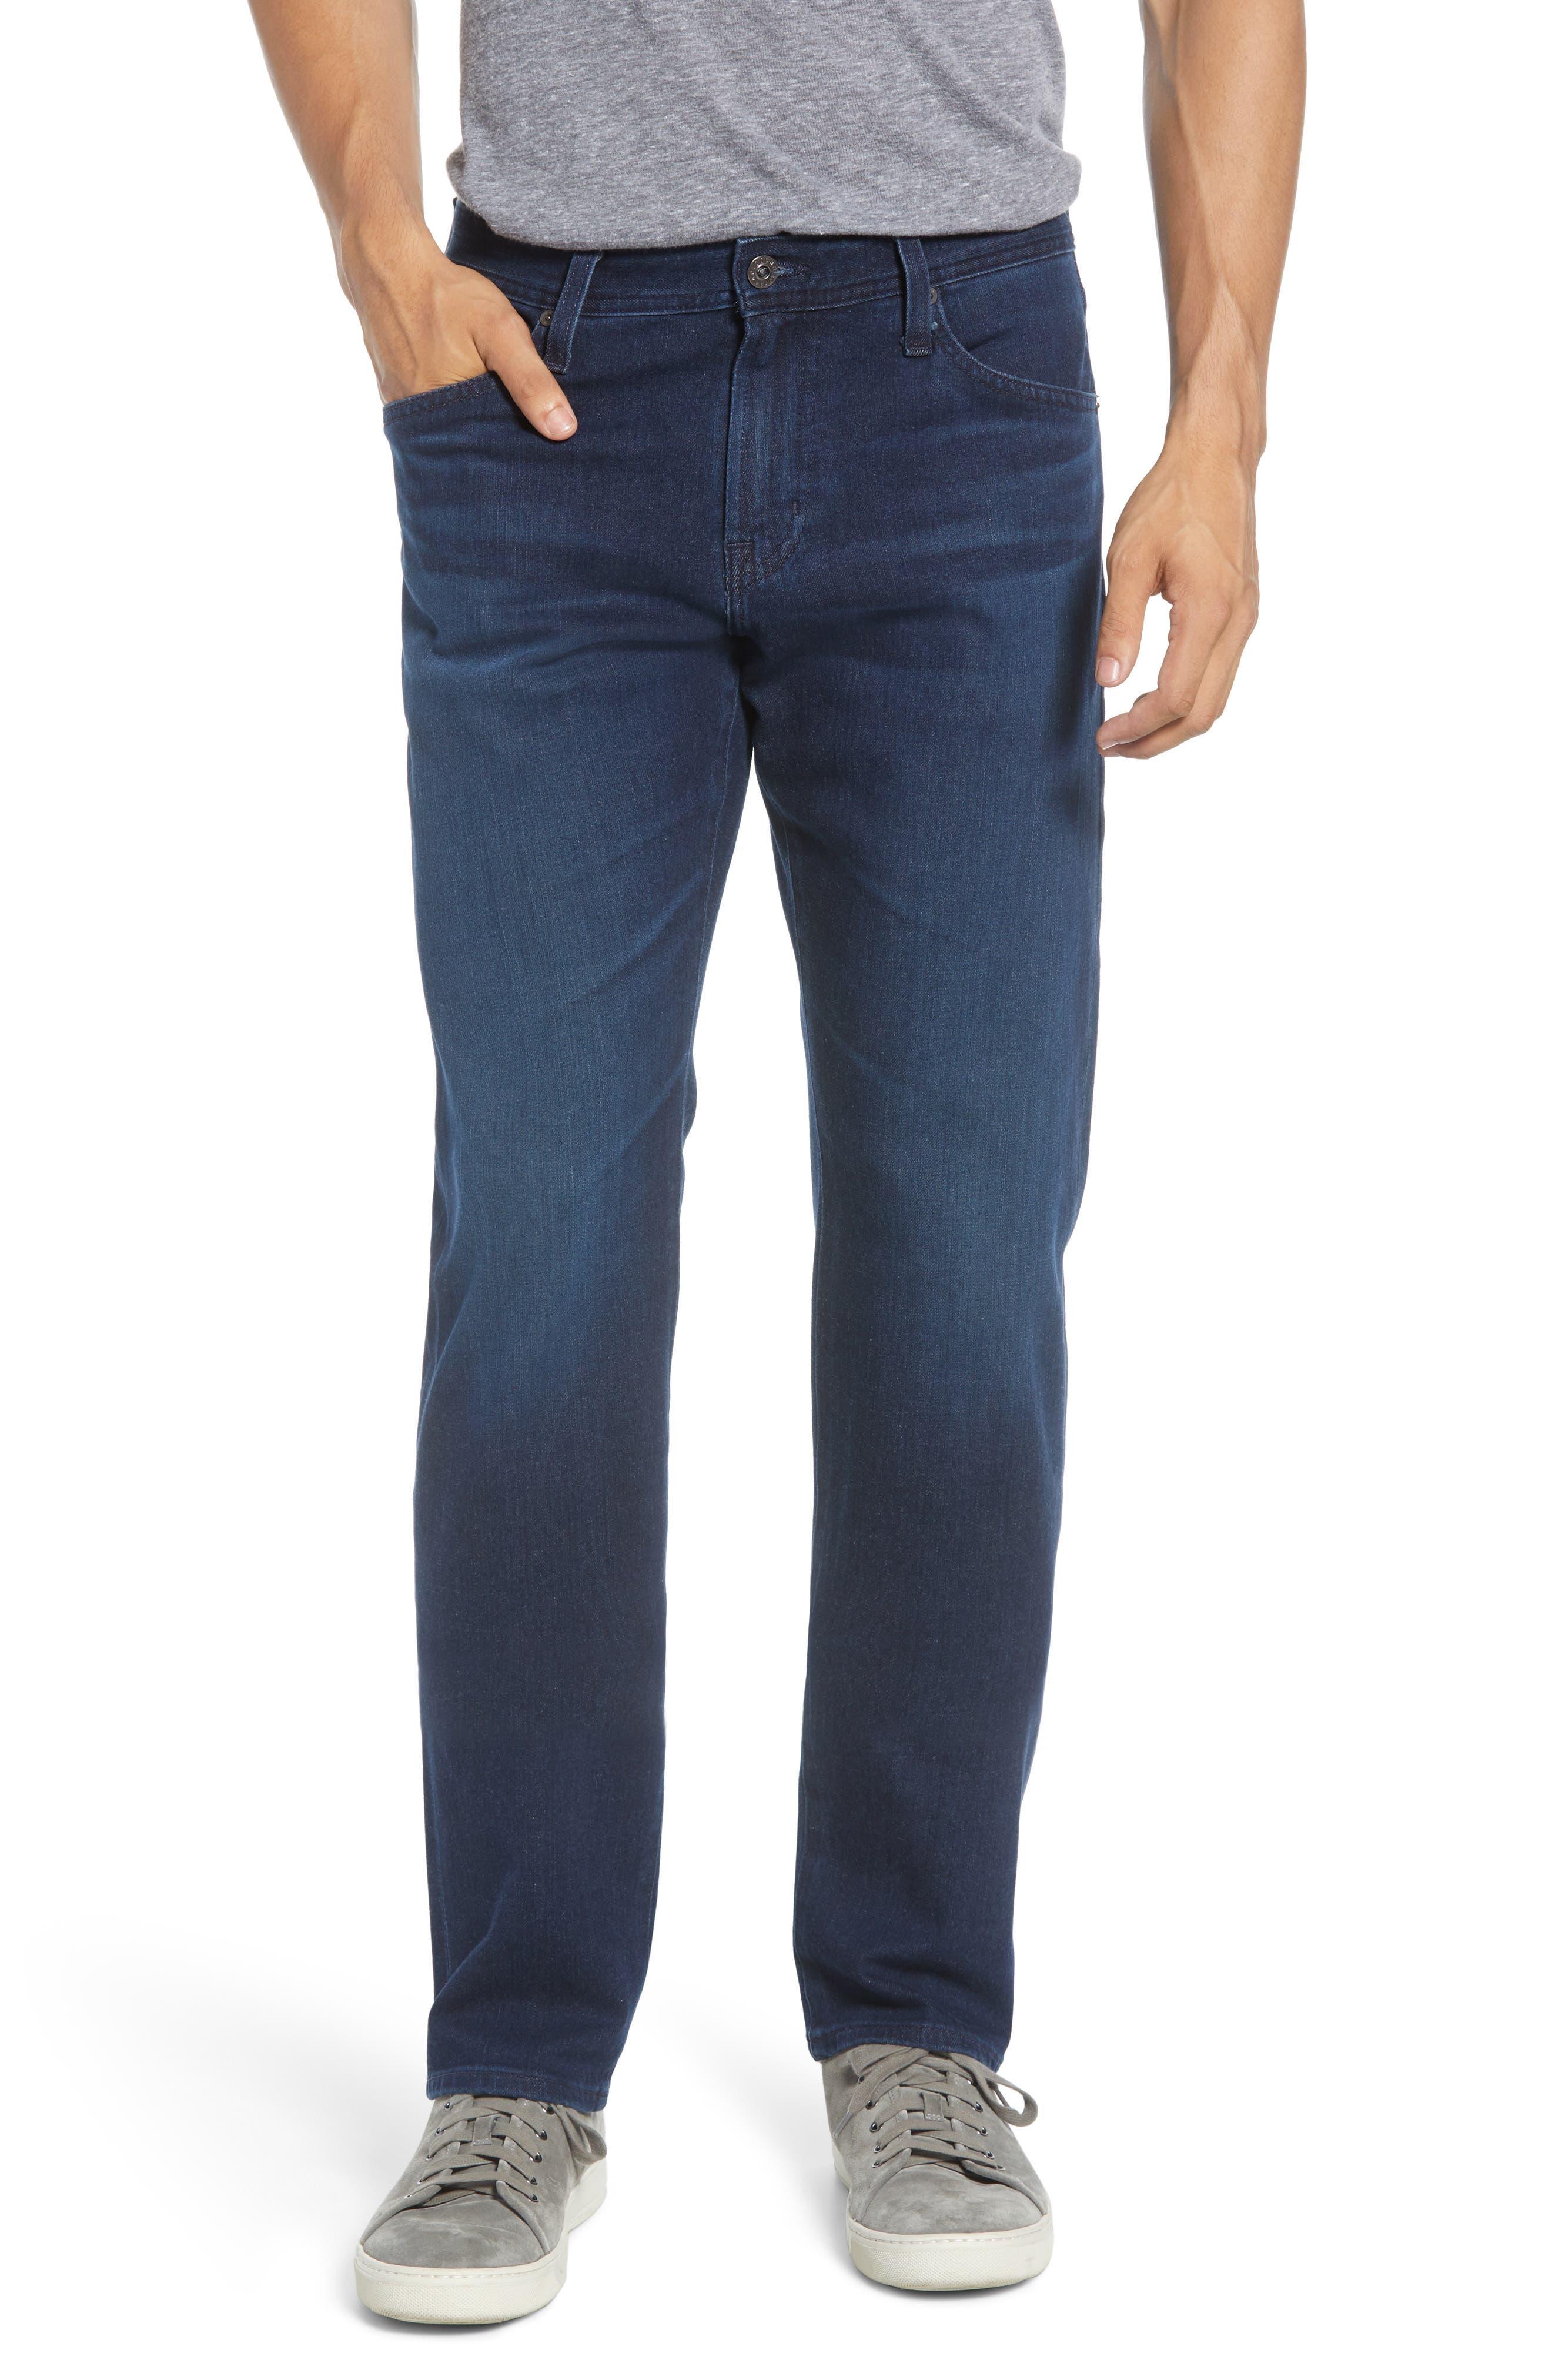 Graduate Slim Straight Fit Jeans